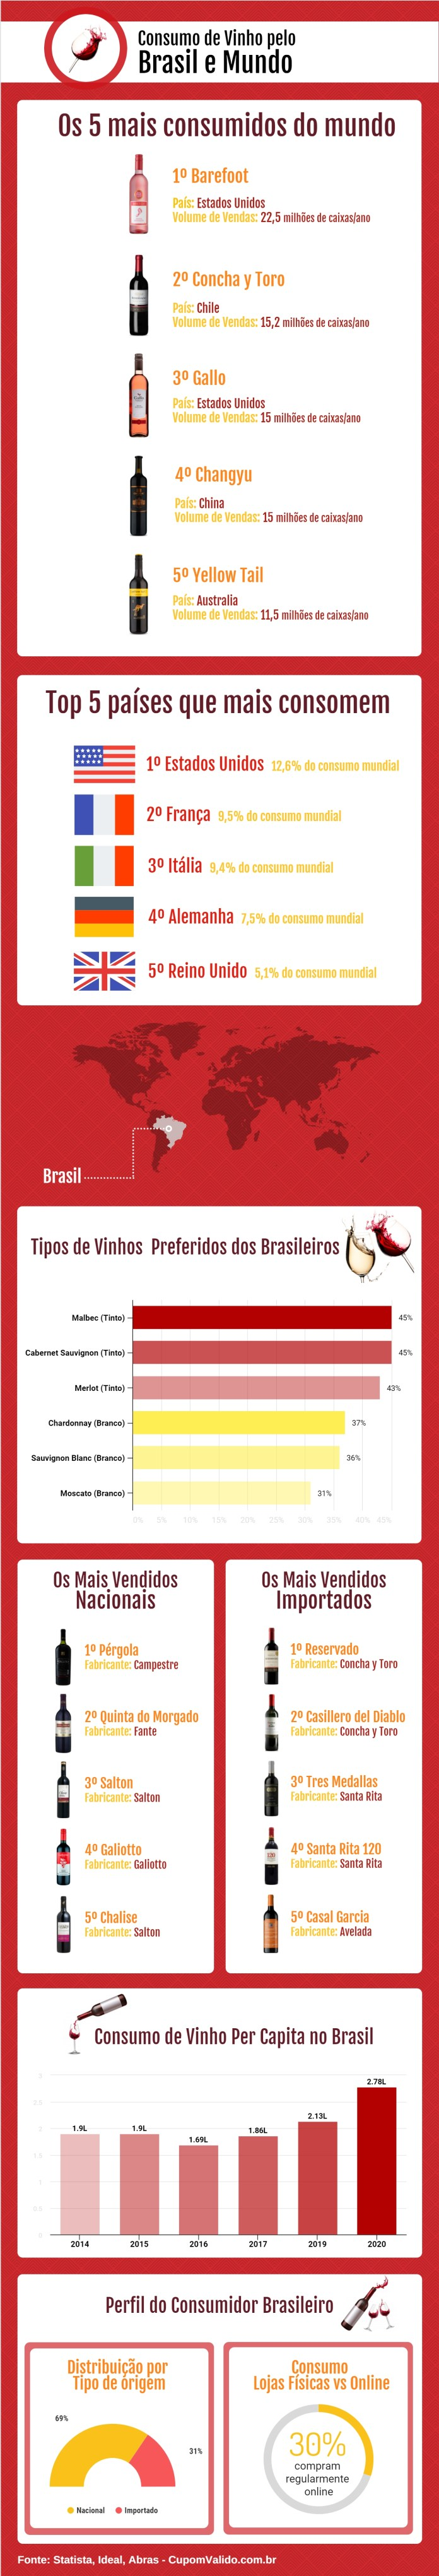 Brasil bate recorde de consumo de vinho